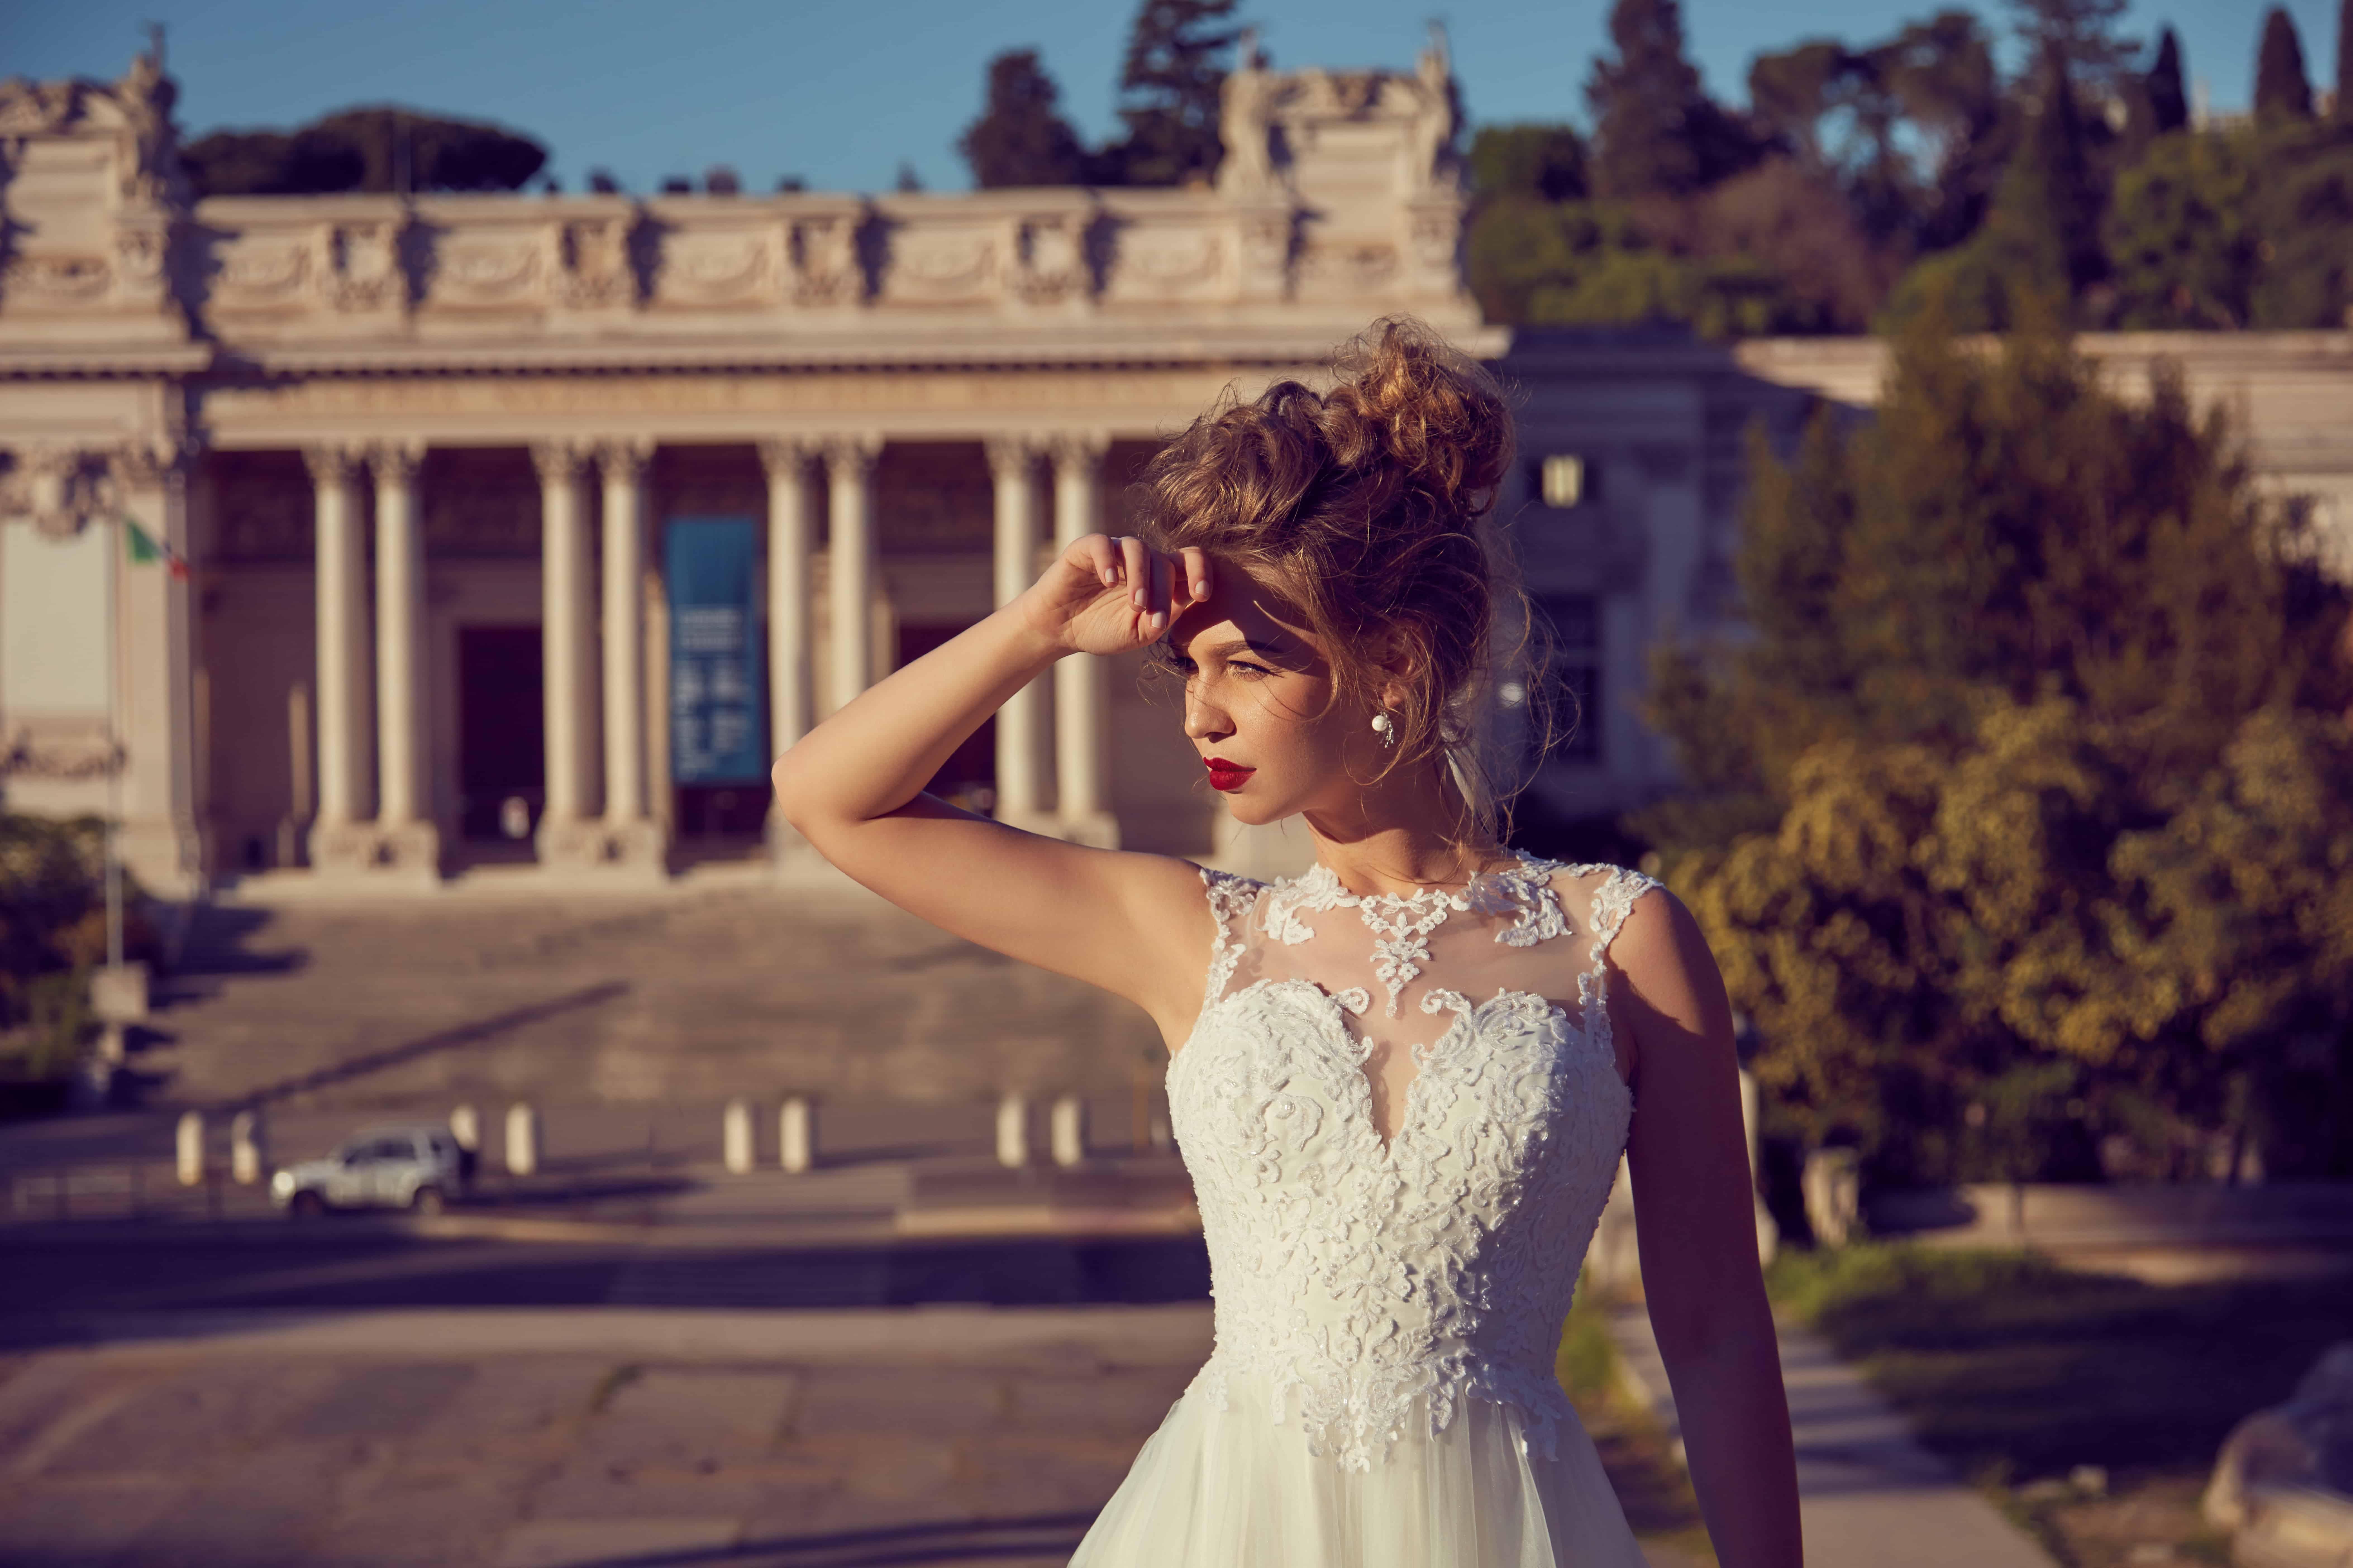 Natalie Model - Colectia Roma - Adora Sposa (4)